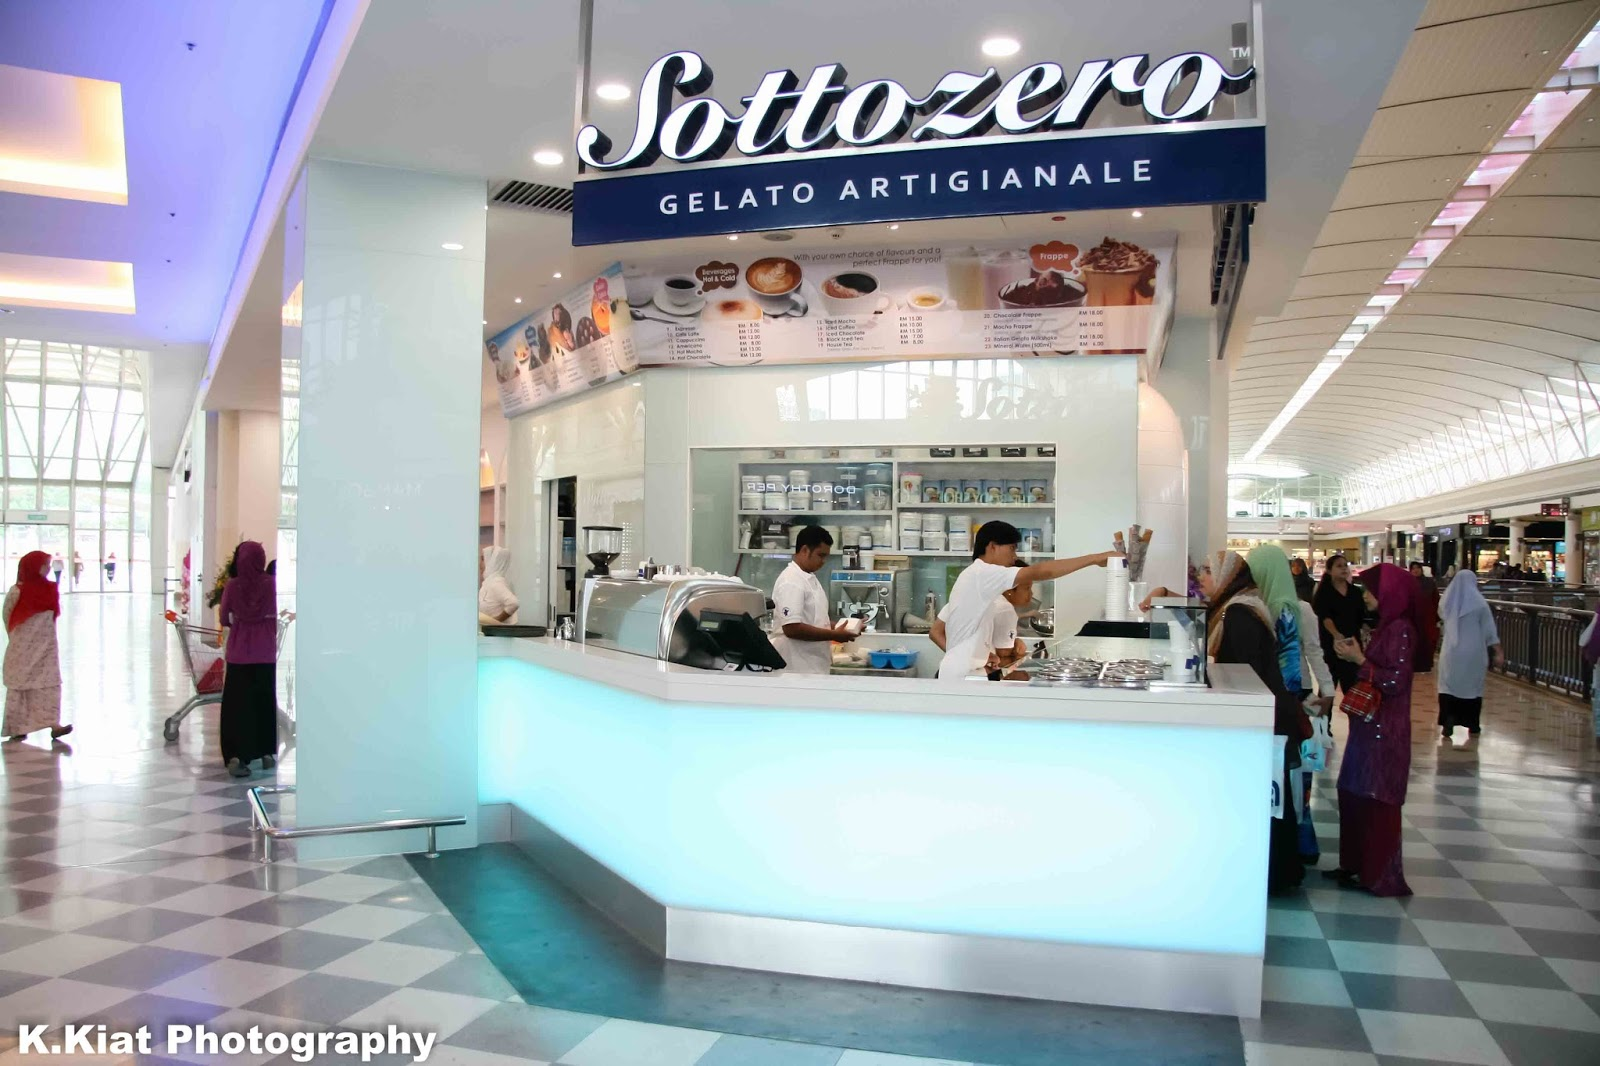 Sottozero, truly Italian Gelato landed in Alamanda Putrajaya | The ...